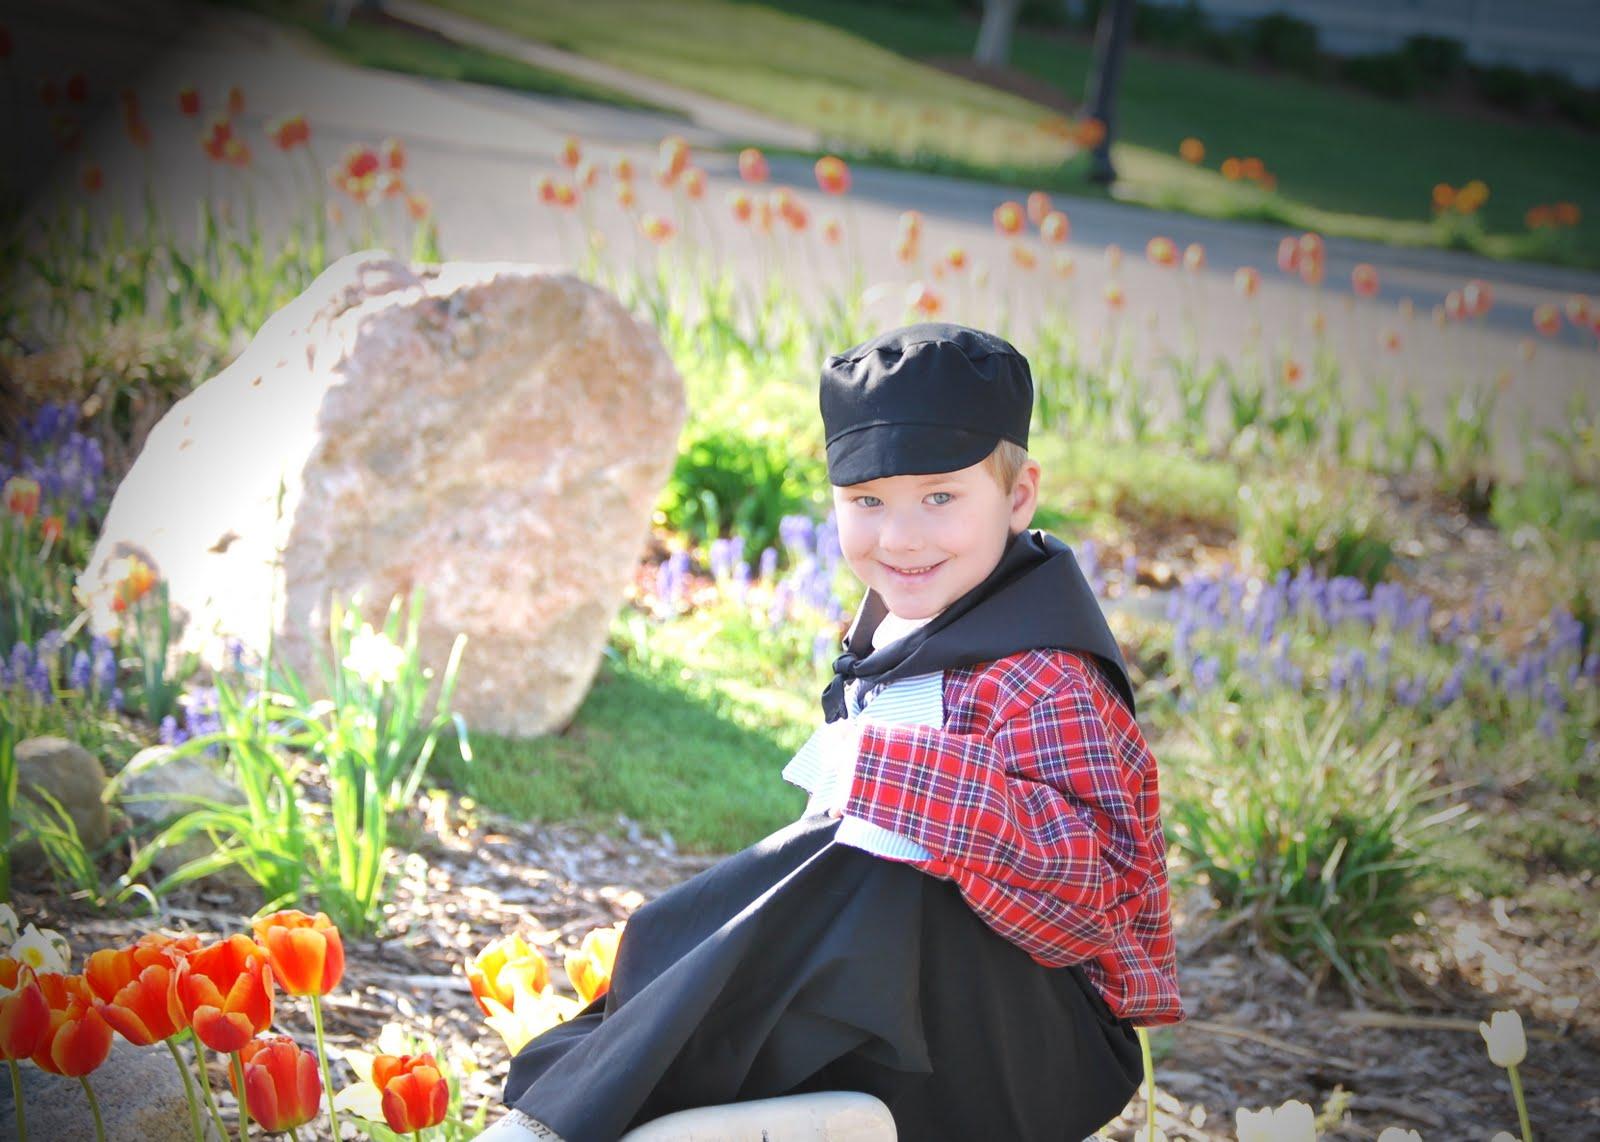 Fits 'N' Giggles Photography: Cute Little Dutch Boy!